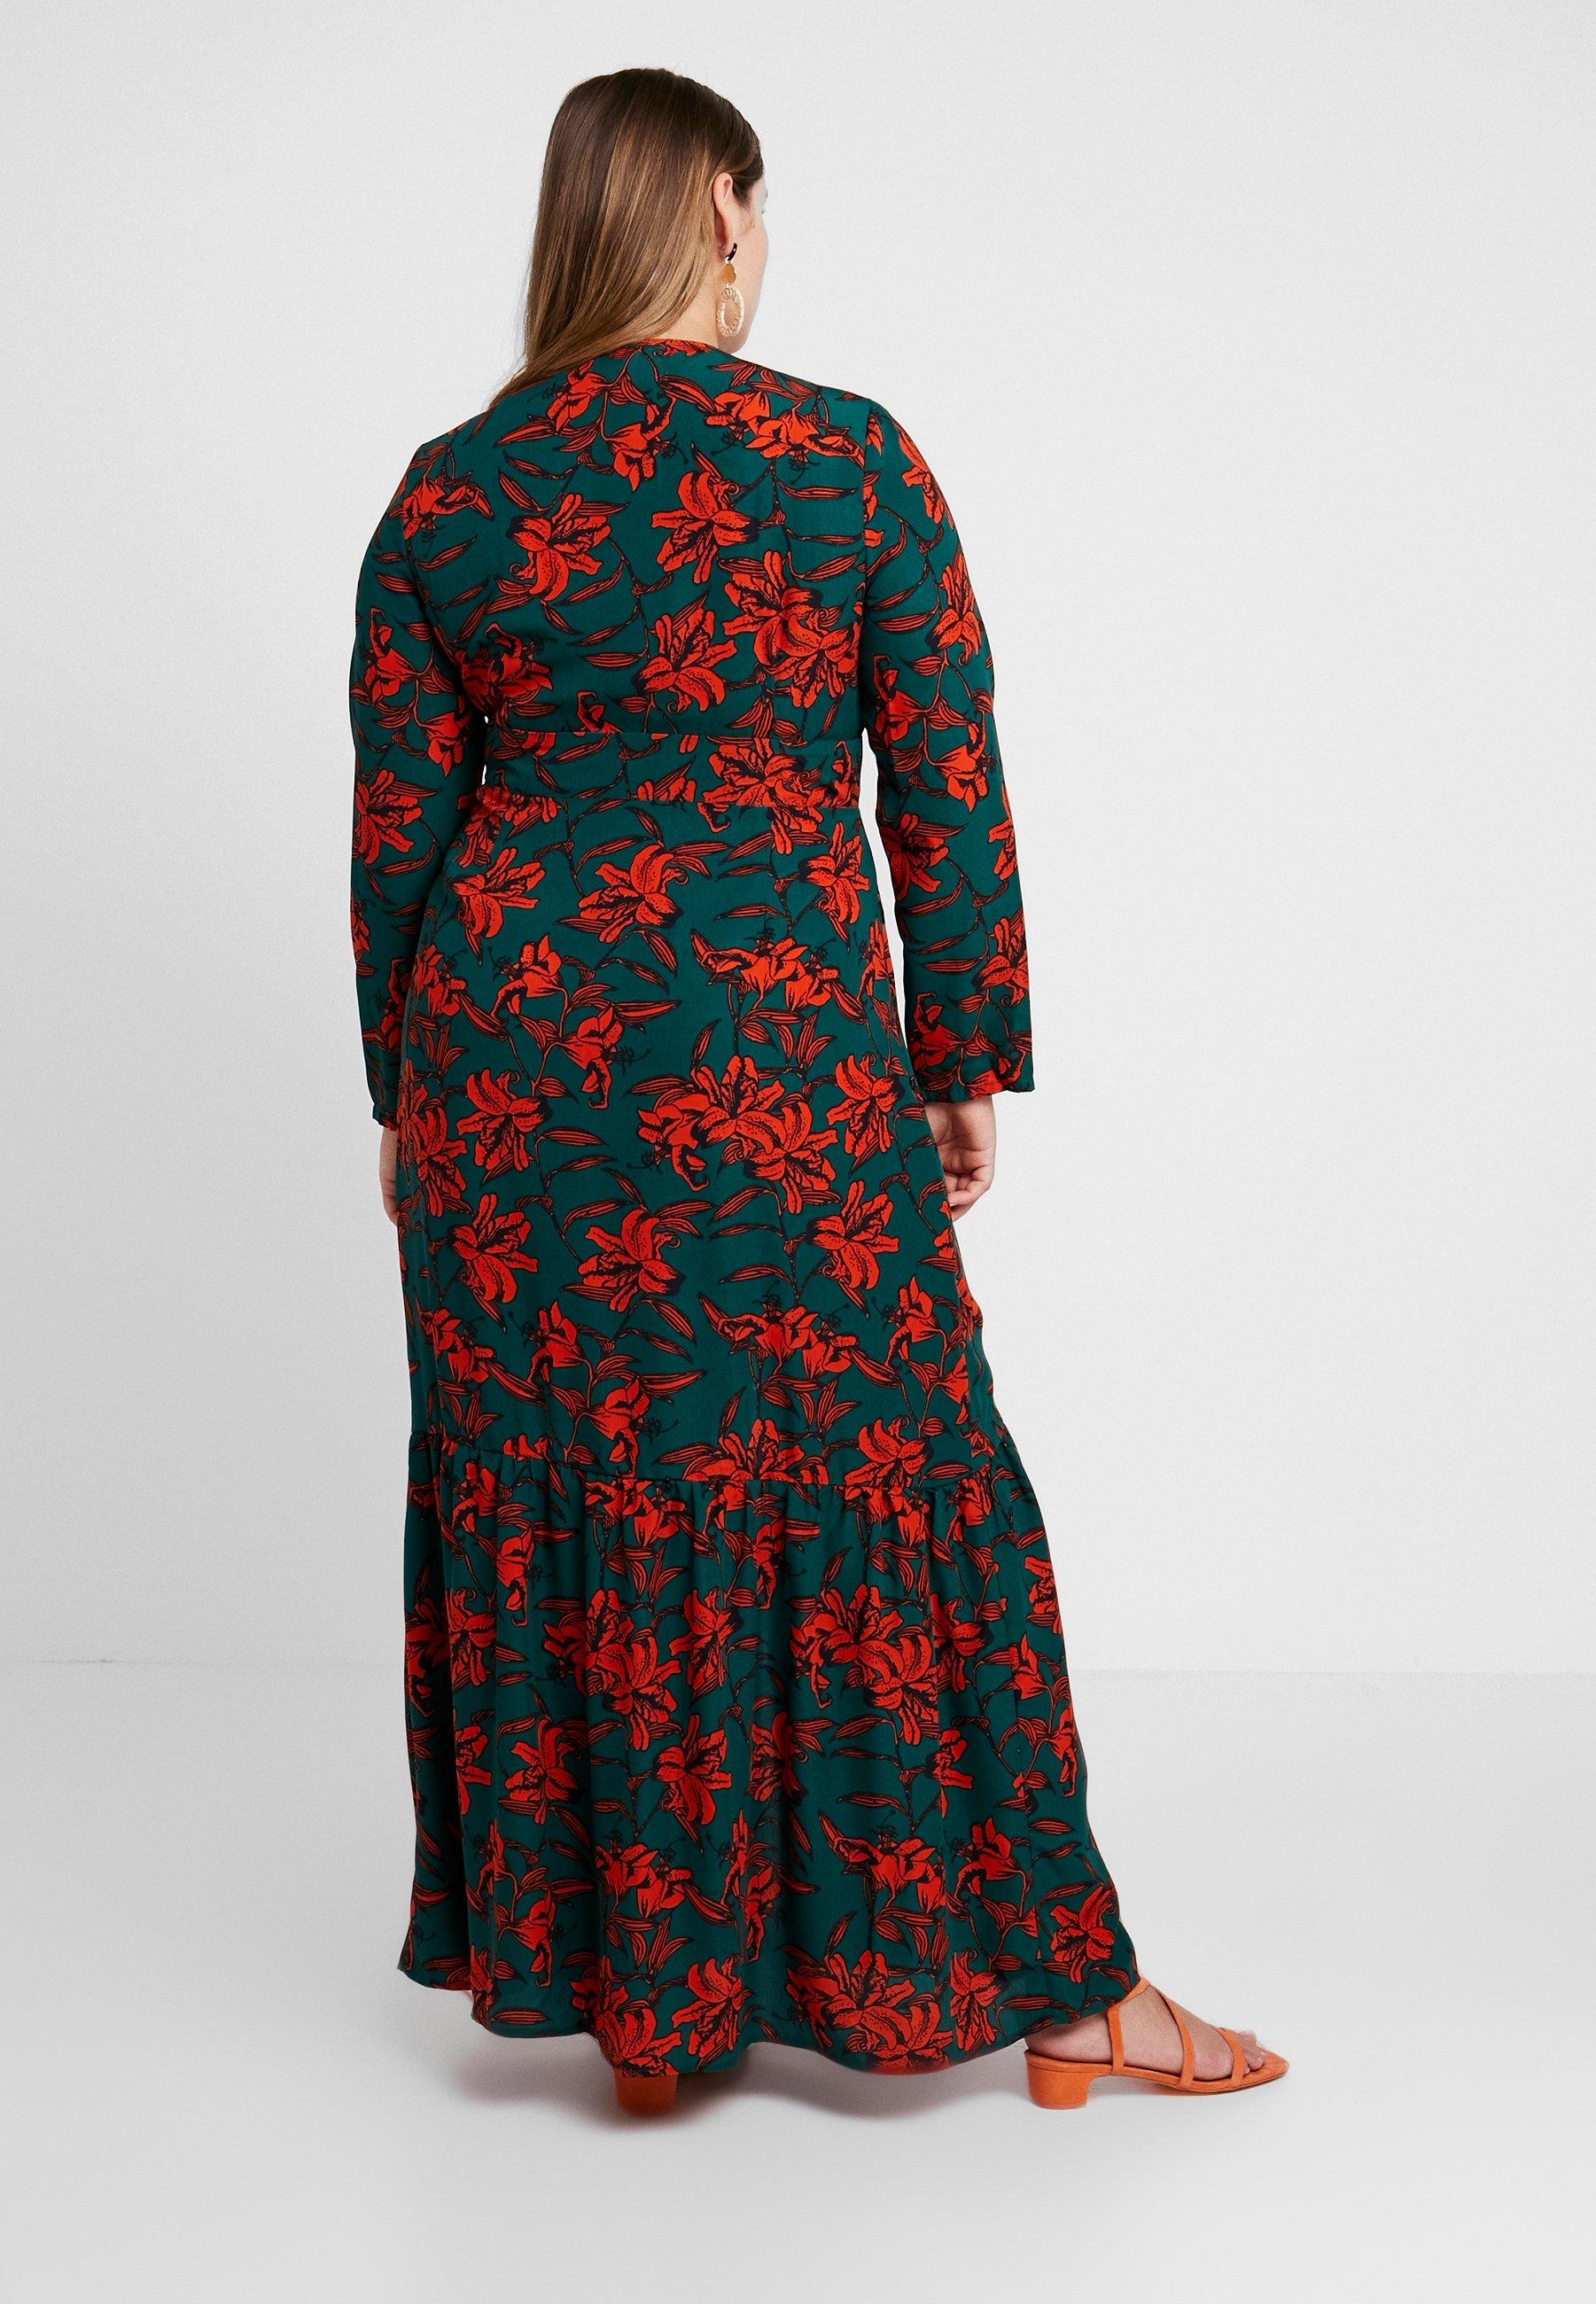 Green Glamorous DressRobe Curve rust Longue A3RjLc5q4